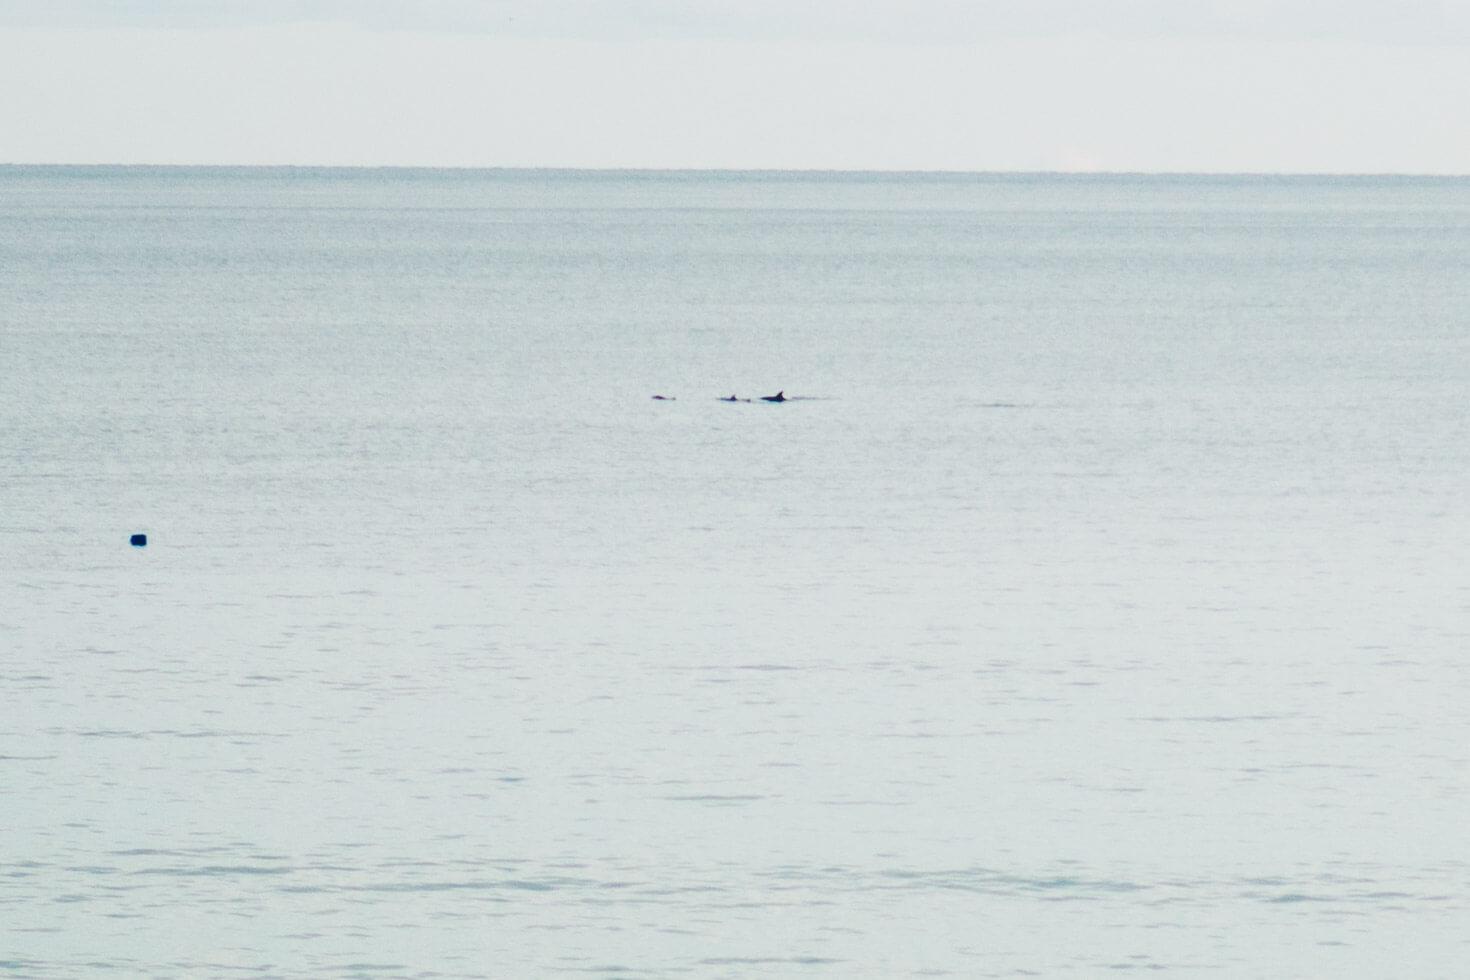 Dolphins at Gylly Beach